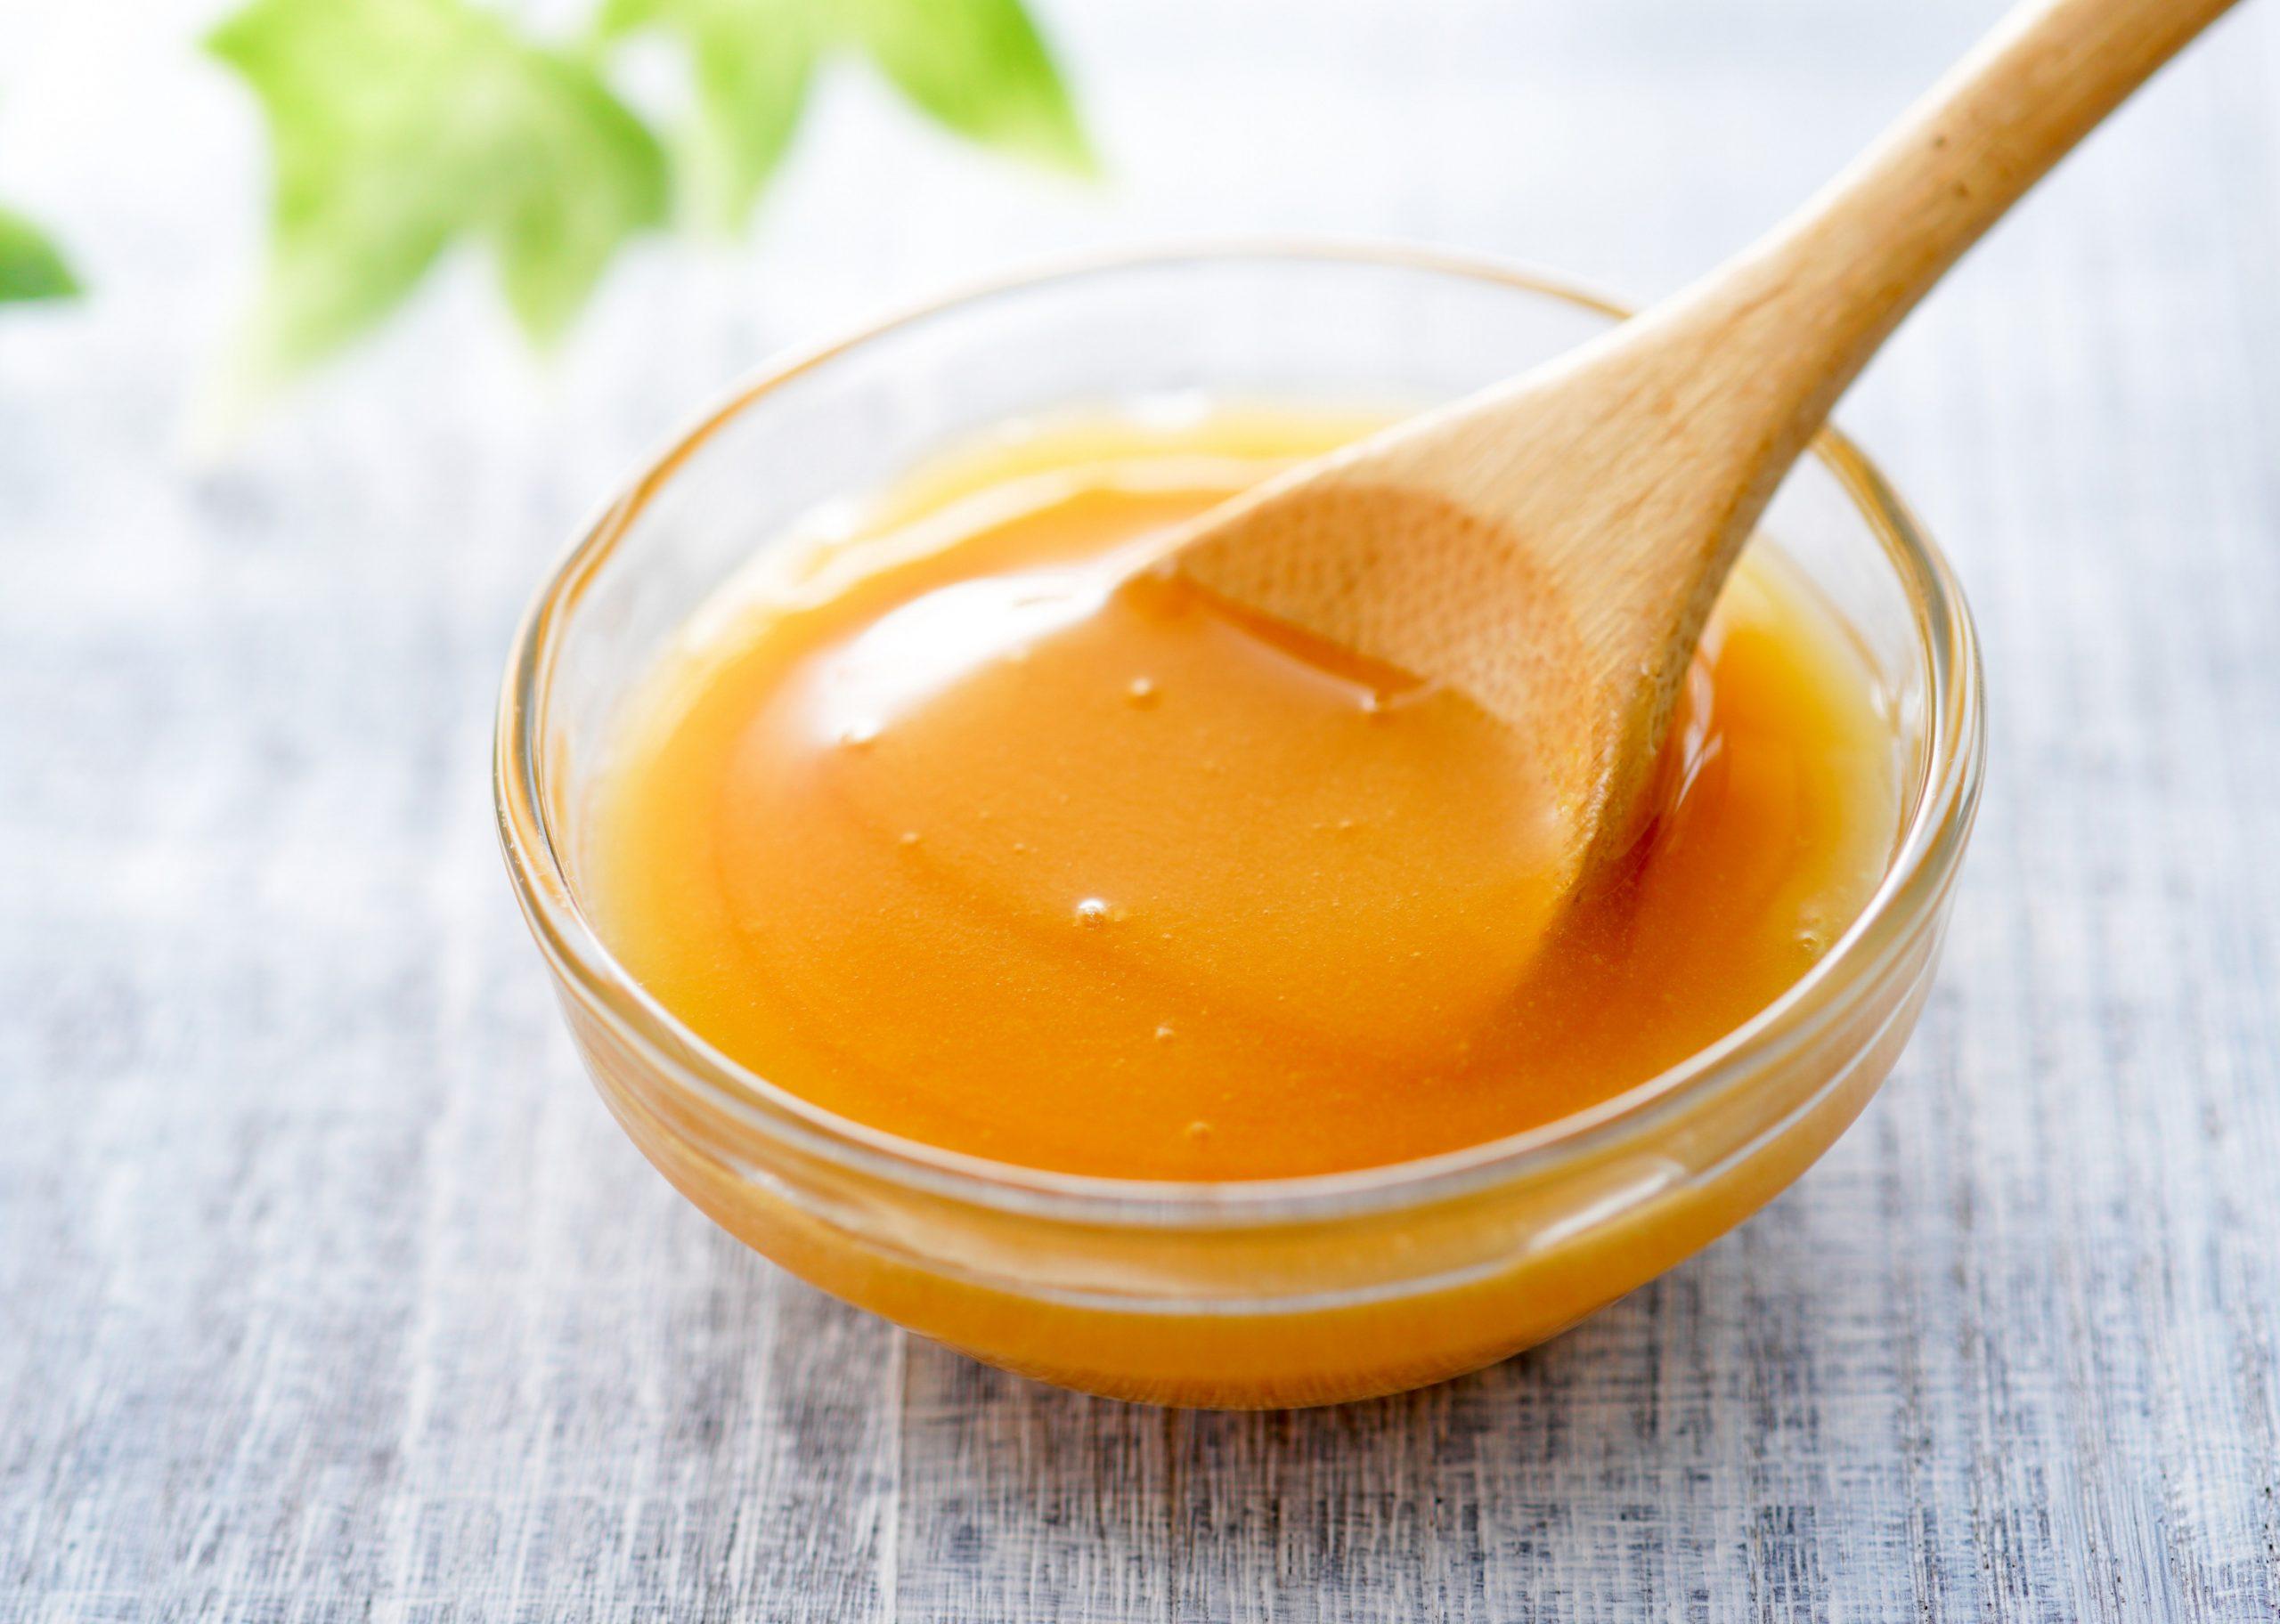 5 Proven Benefits And Uses Of Manuka Honey